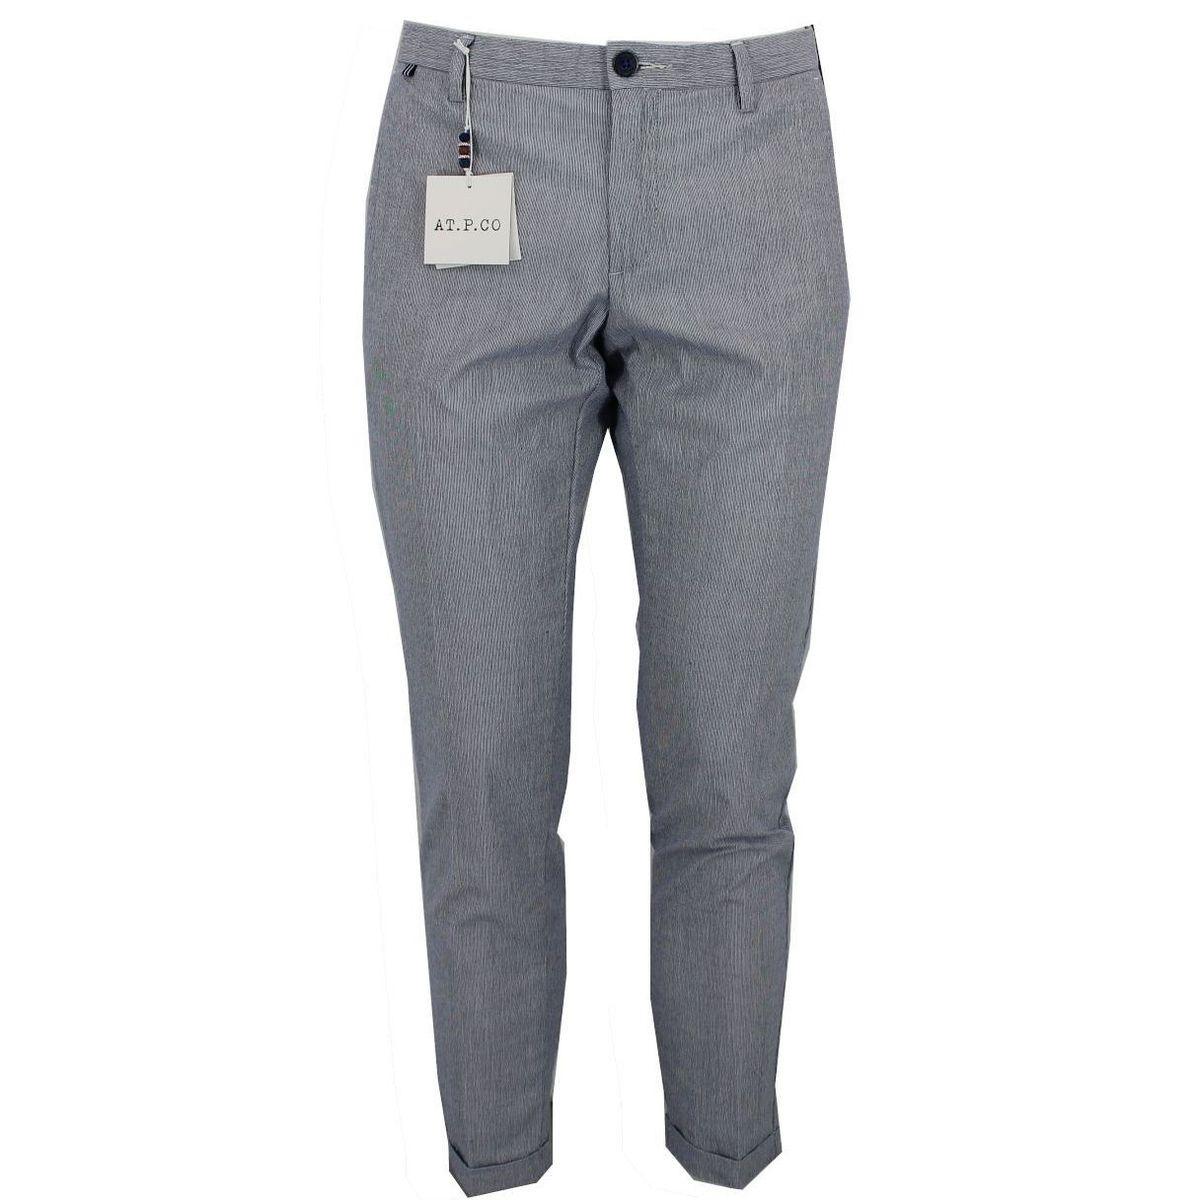 Pantalone in cotone Celeste At.p.co